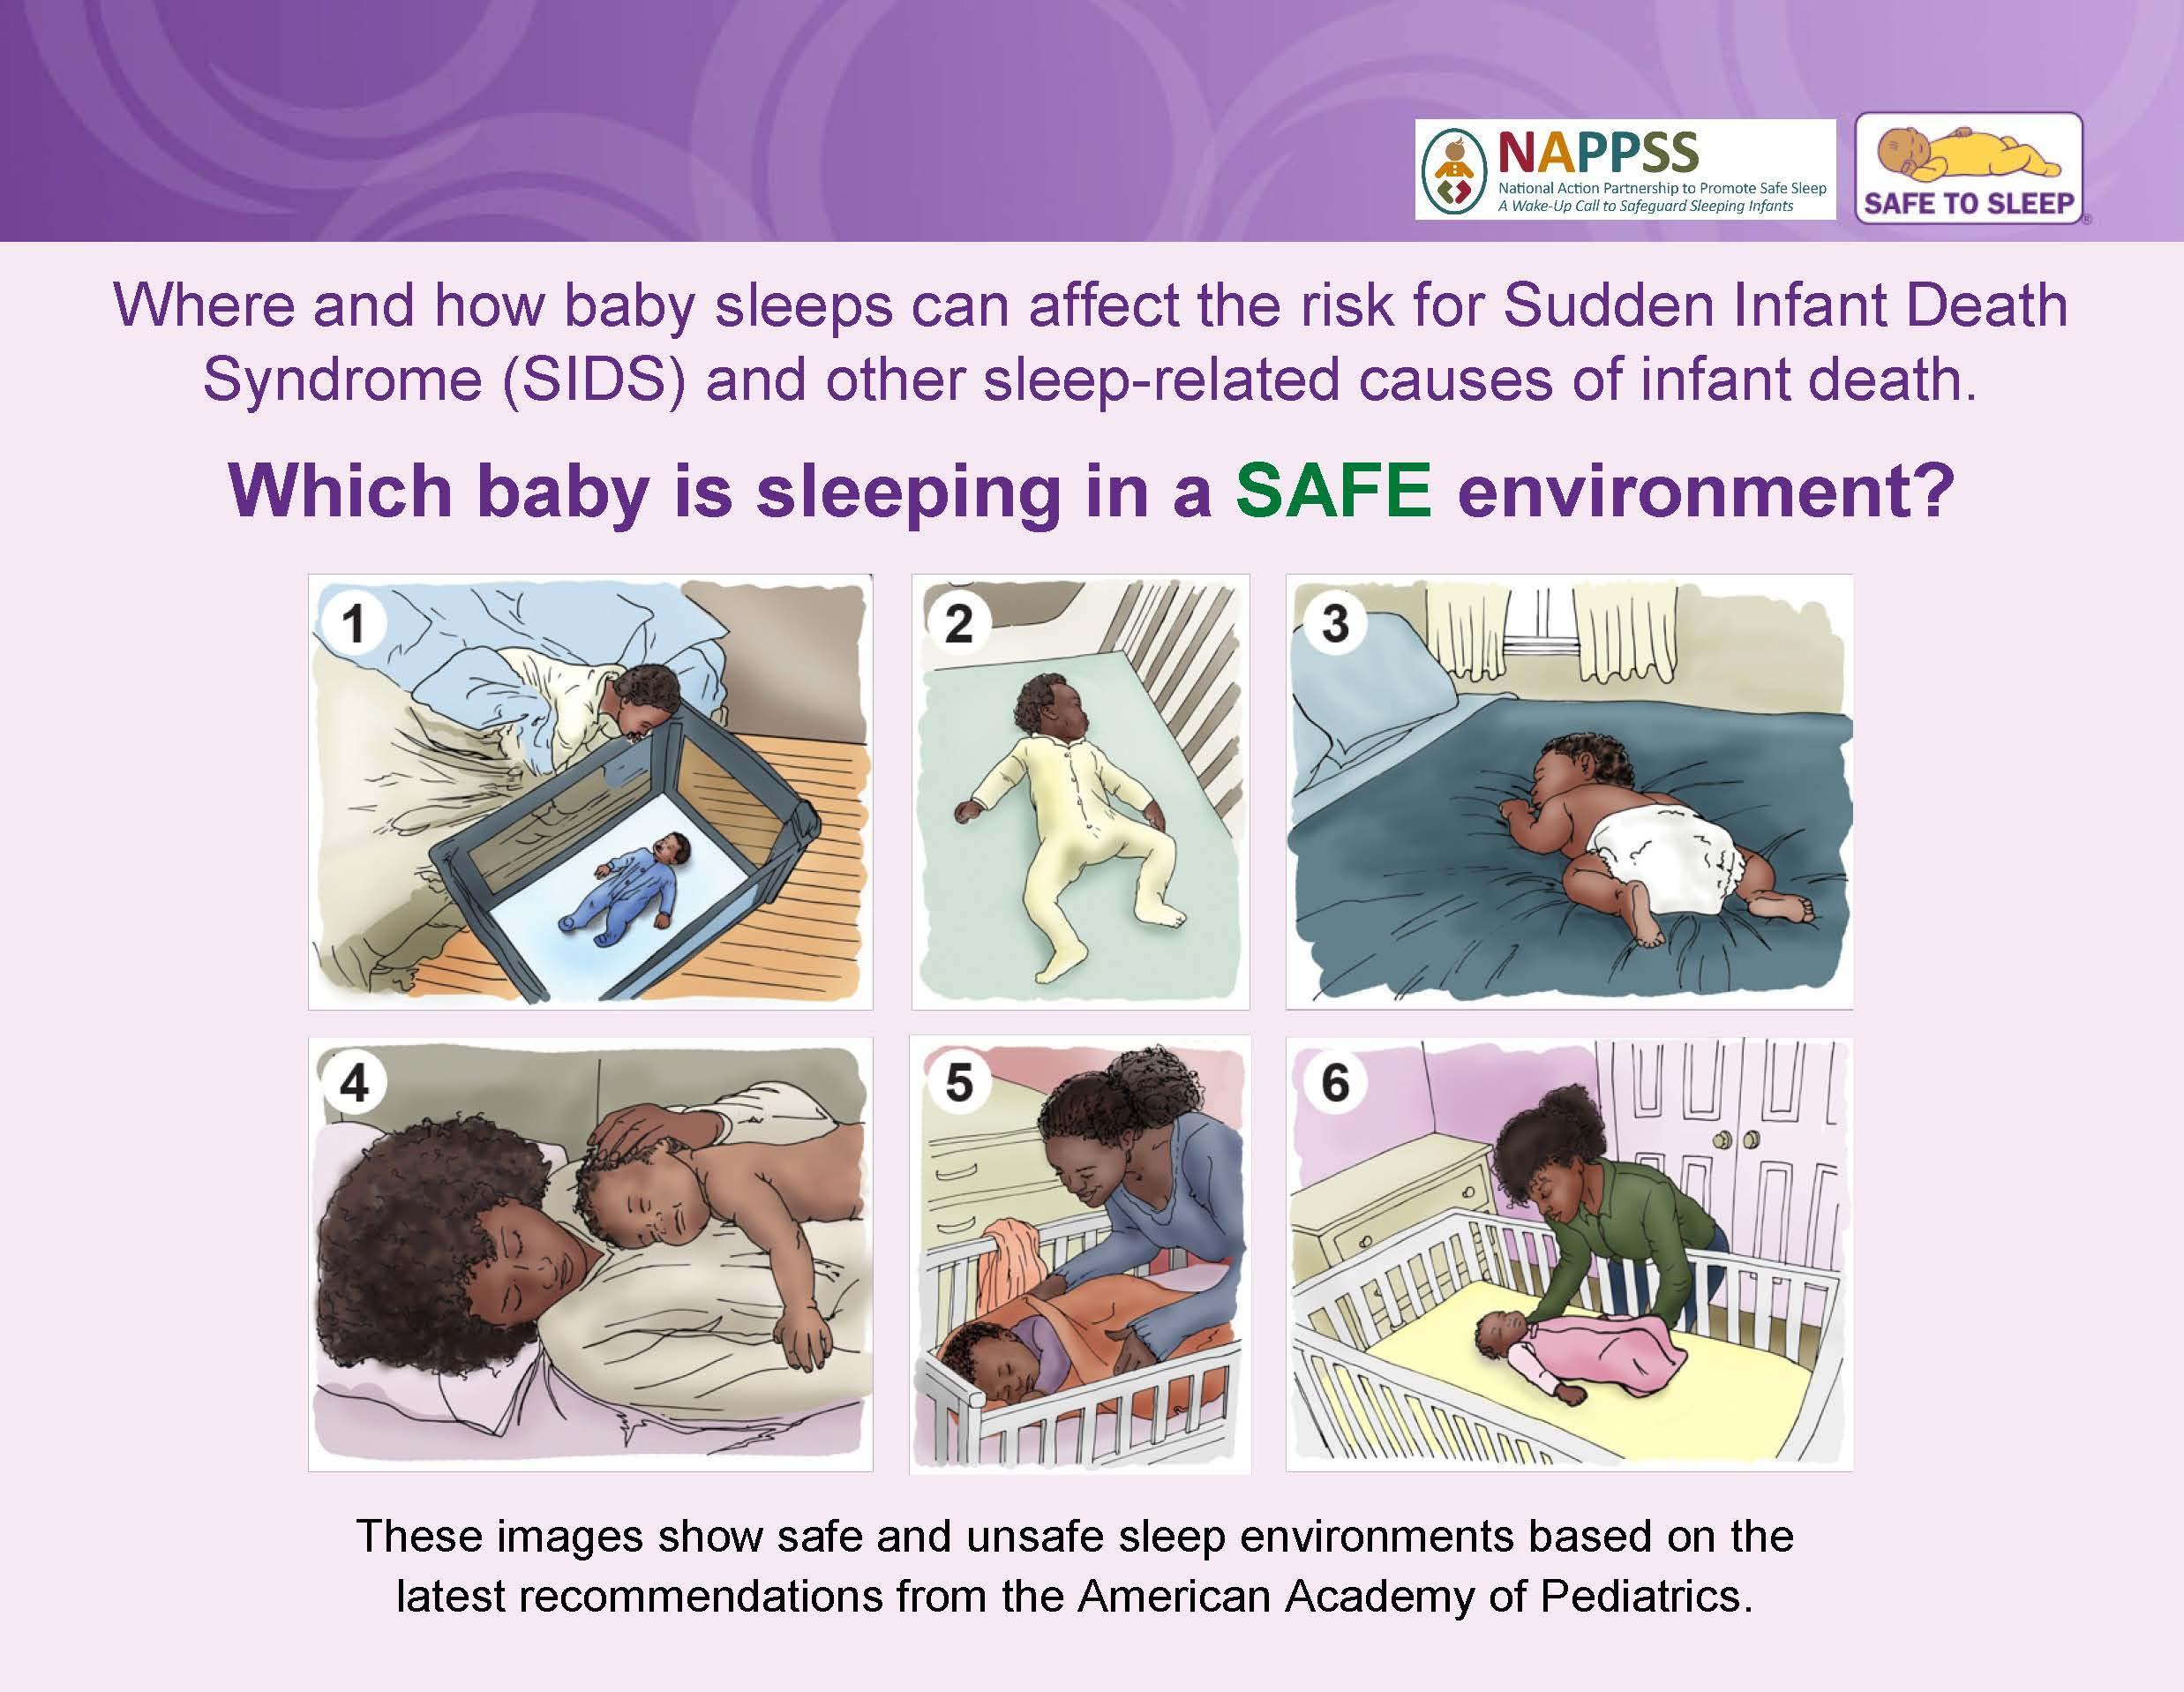 help-baby-sleep-safely-slide-1-of-4_29319731403_o